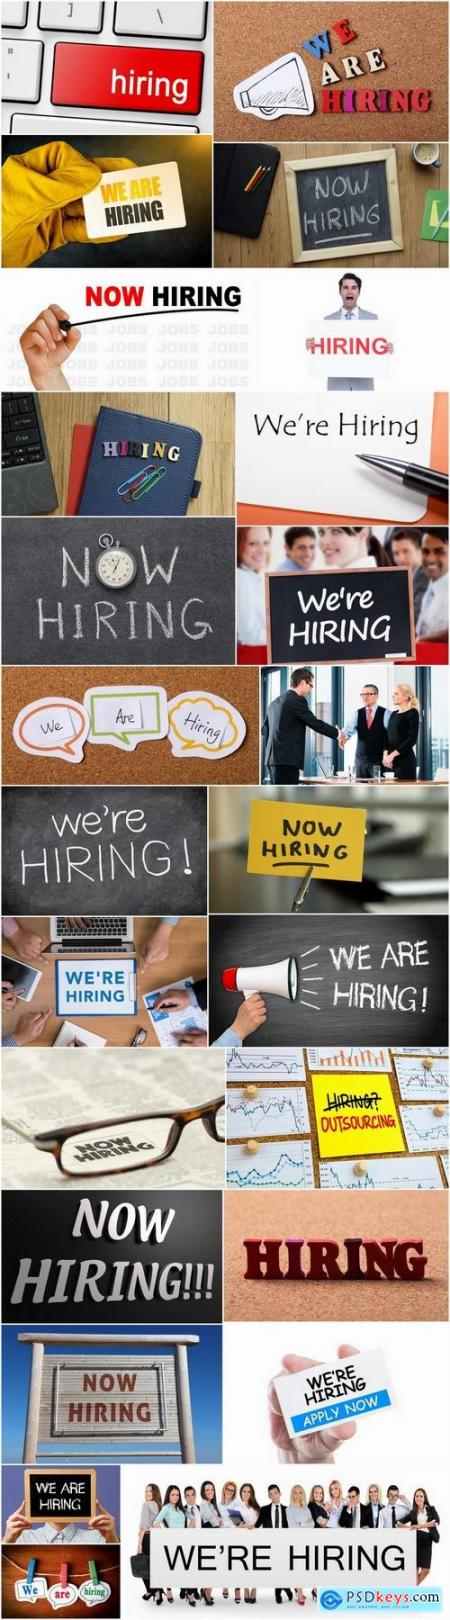 Slogan recruitment classified advertising business motto 25 HQ Jpeg